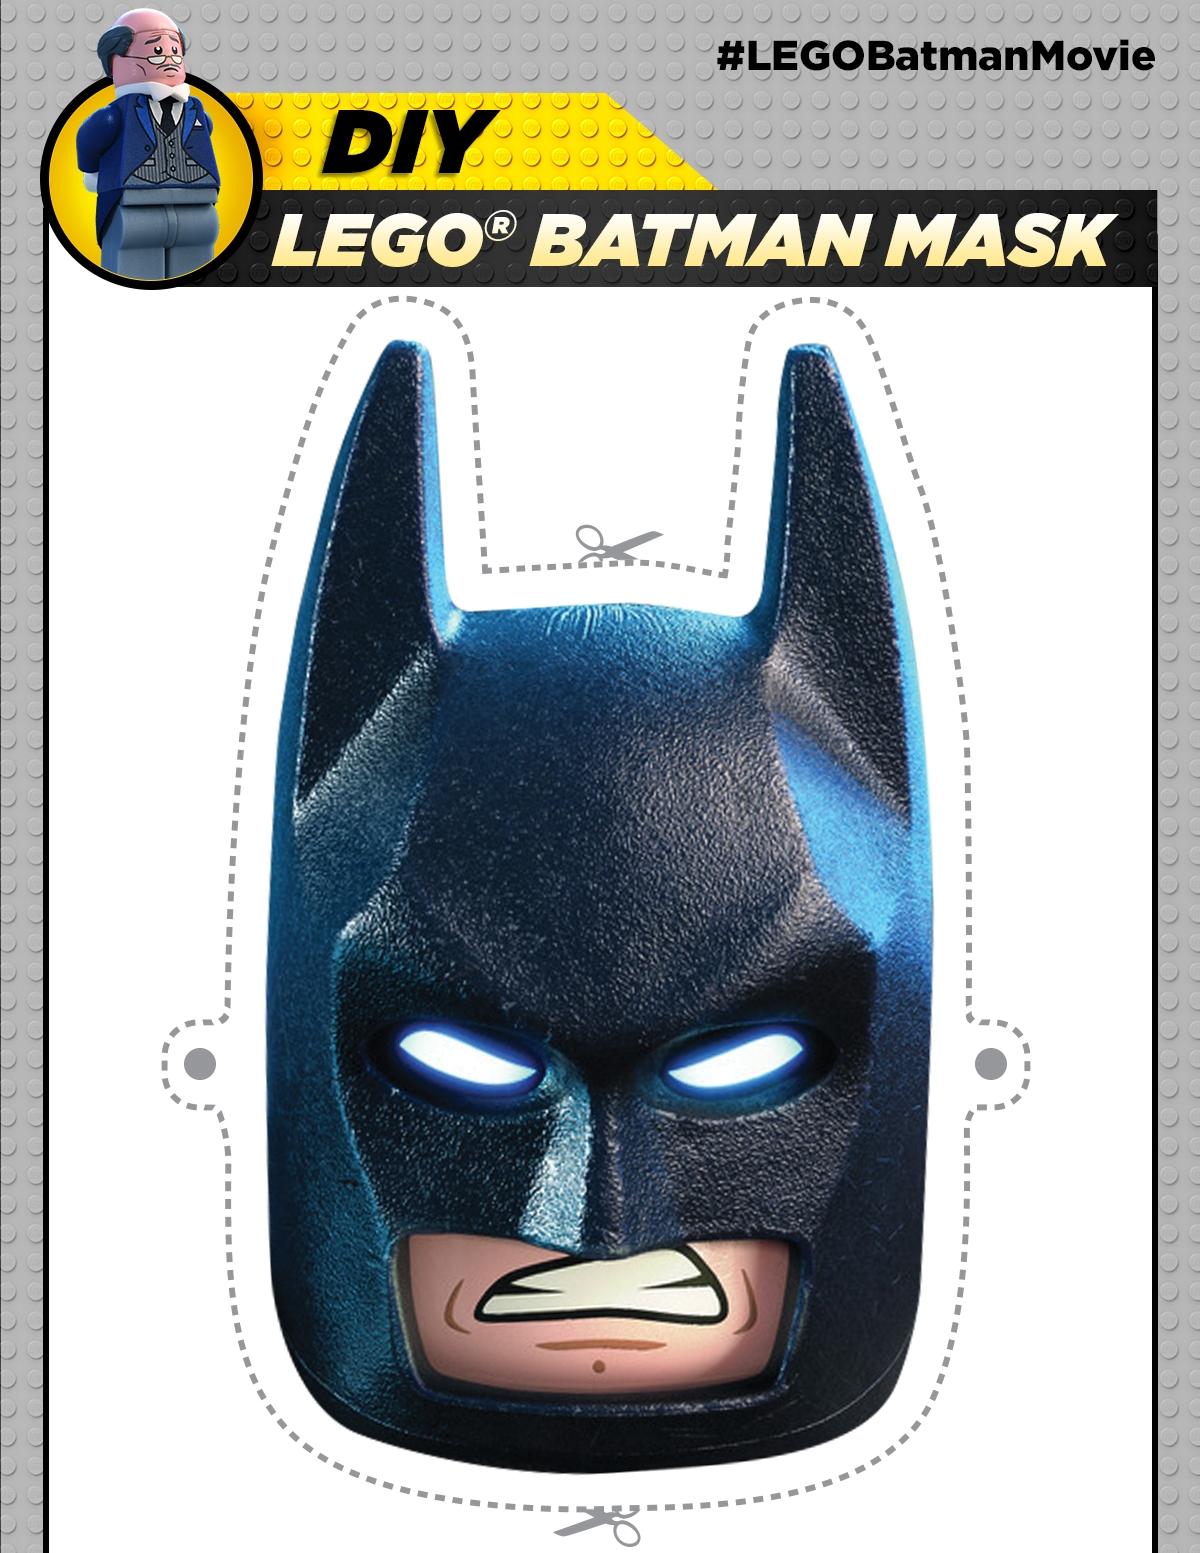 LEGB_DIYBoard_BatmanMask_v1b_master-rev-1   Confusions and ...